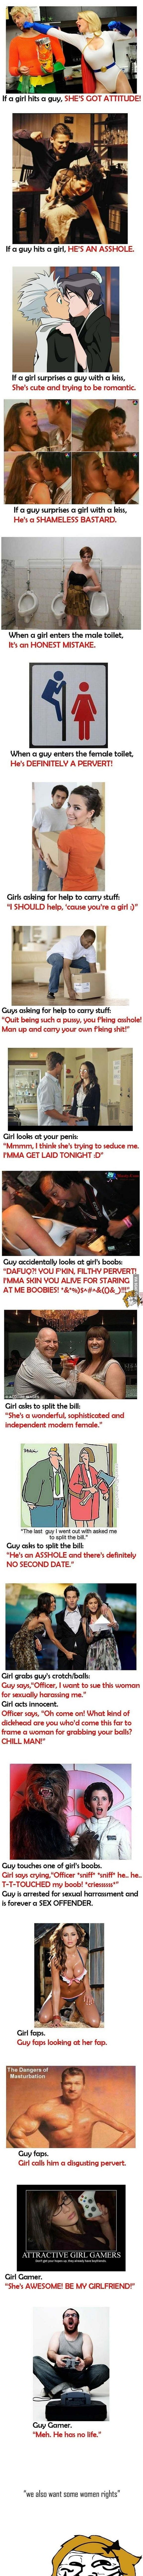 Scumbag Women